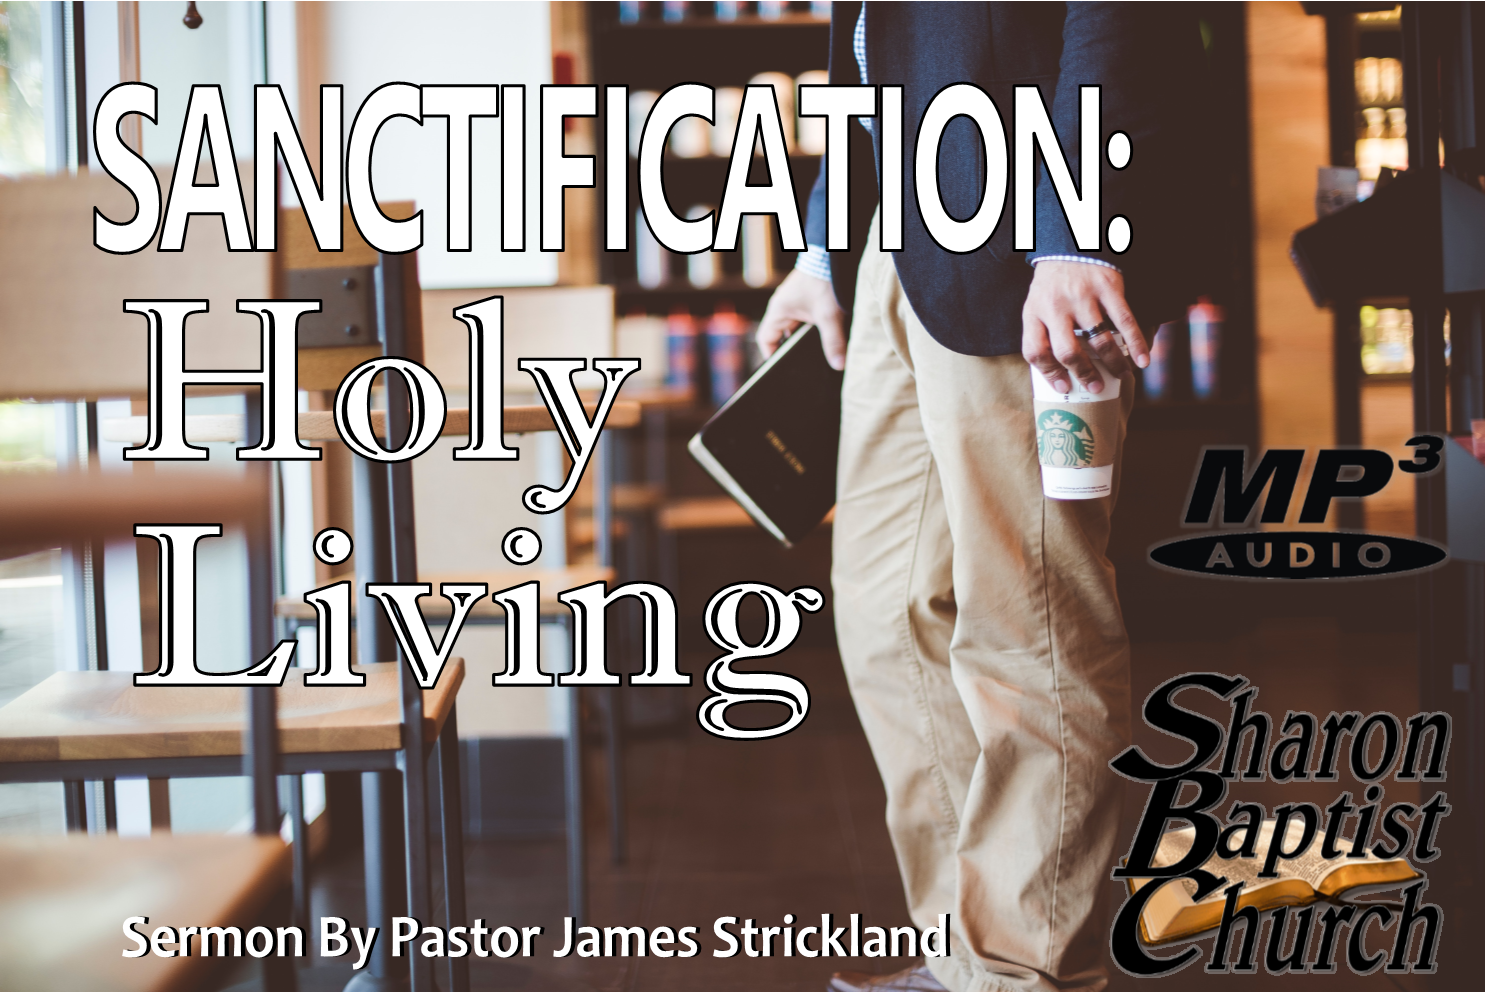 Sanctification or Holy Living - John 17 6-19 - SERMON